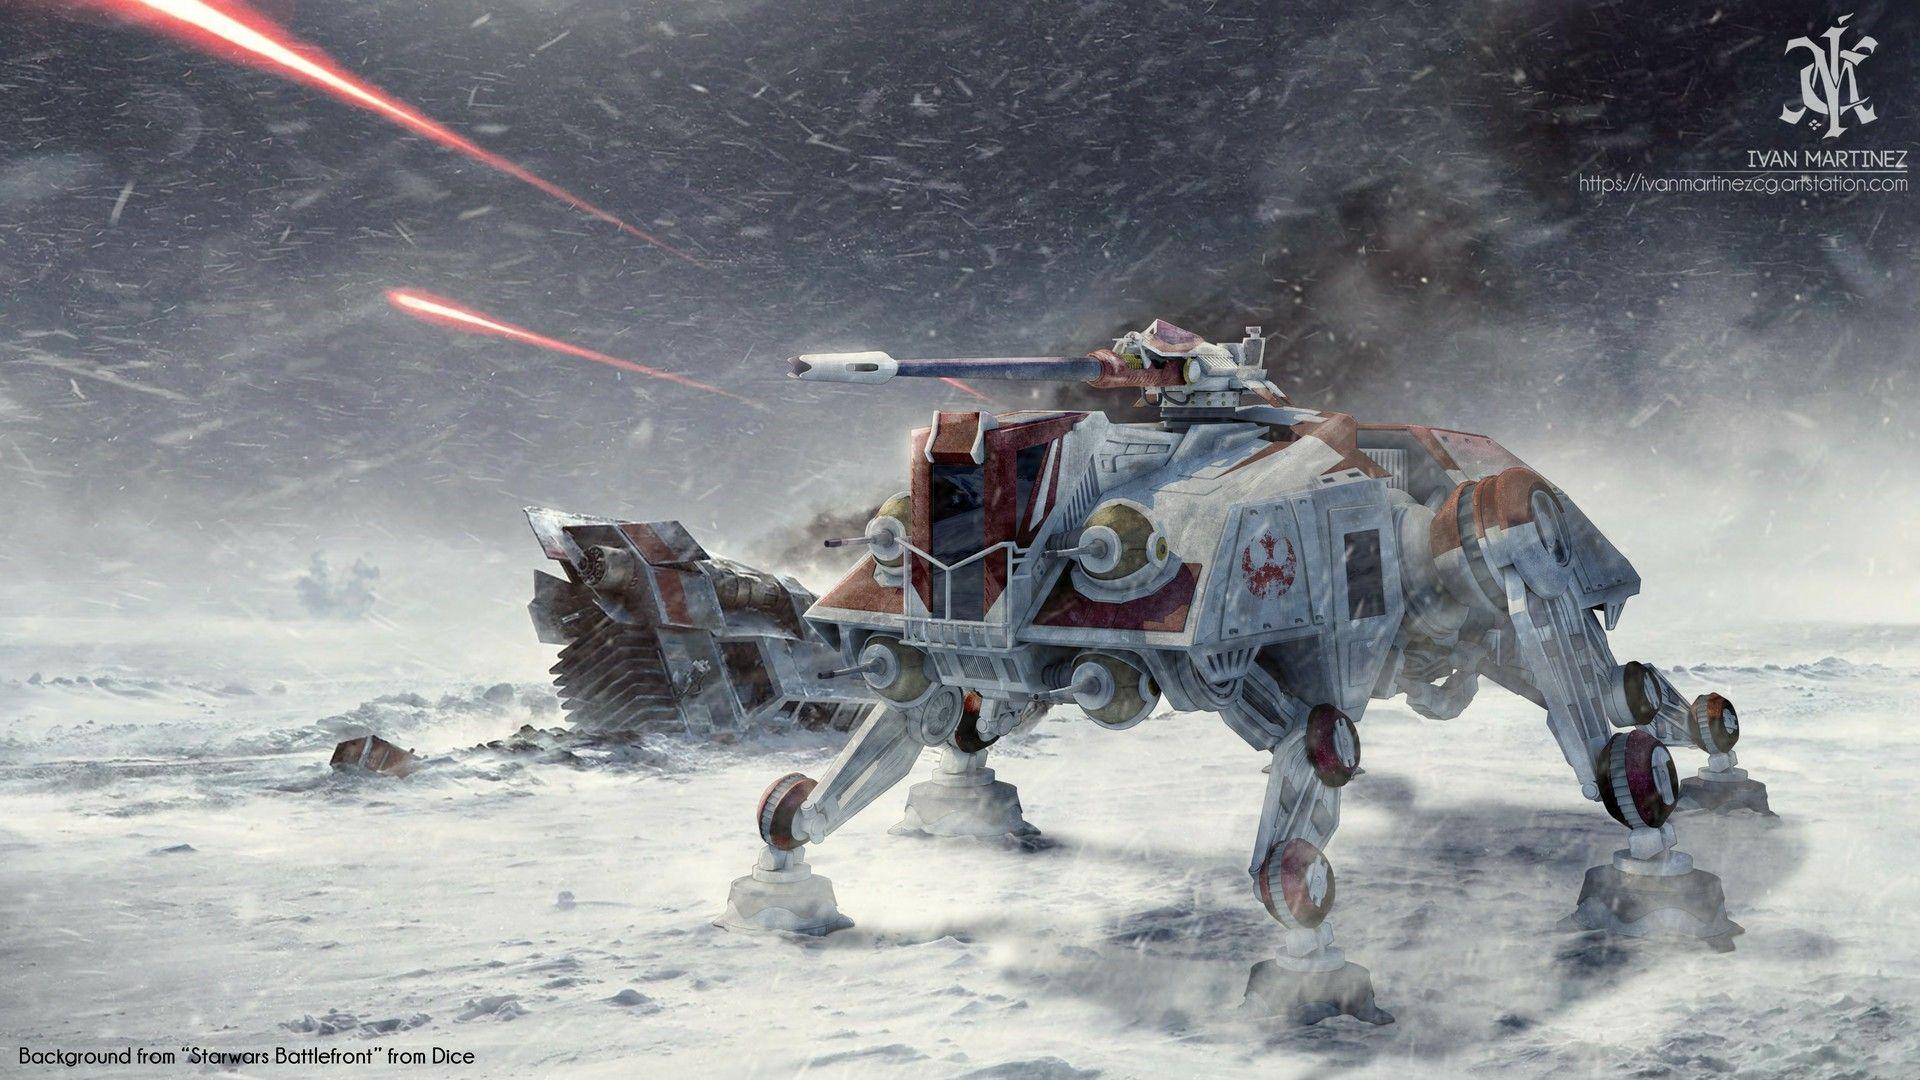 Atte On Snow Terrain Star Wars Ships Star Wars Vehicles Star Wars Images